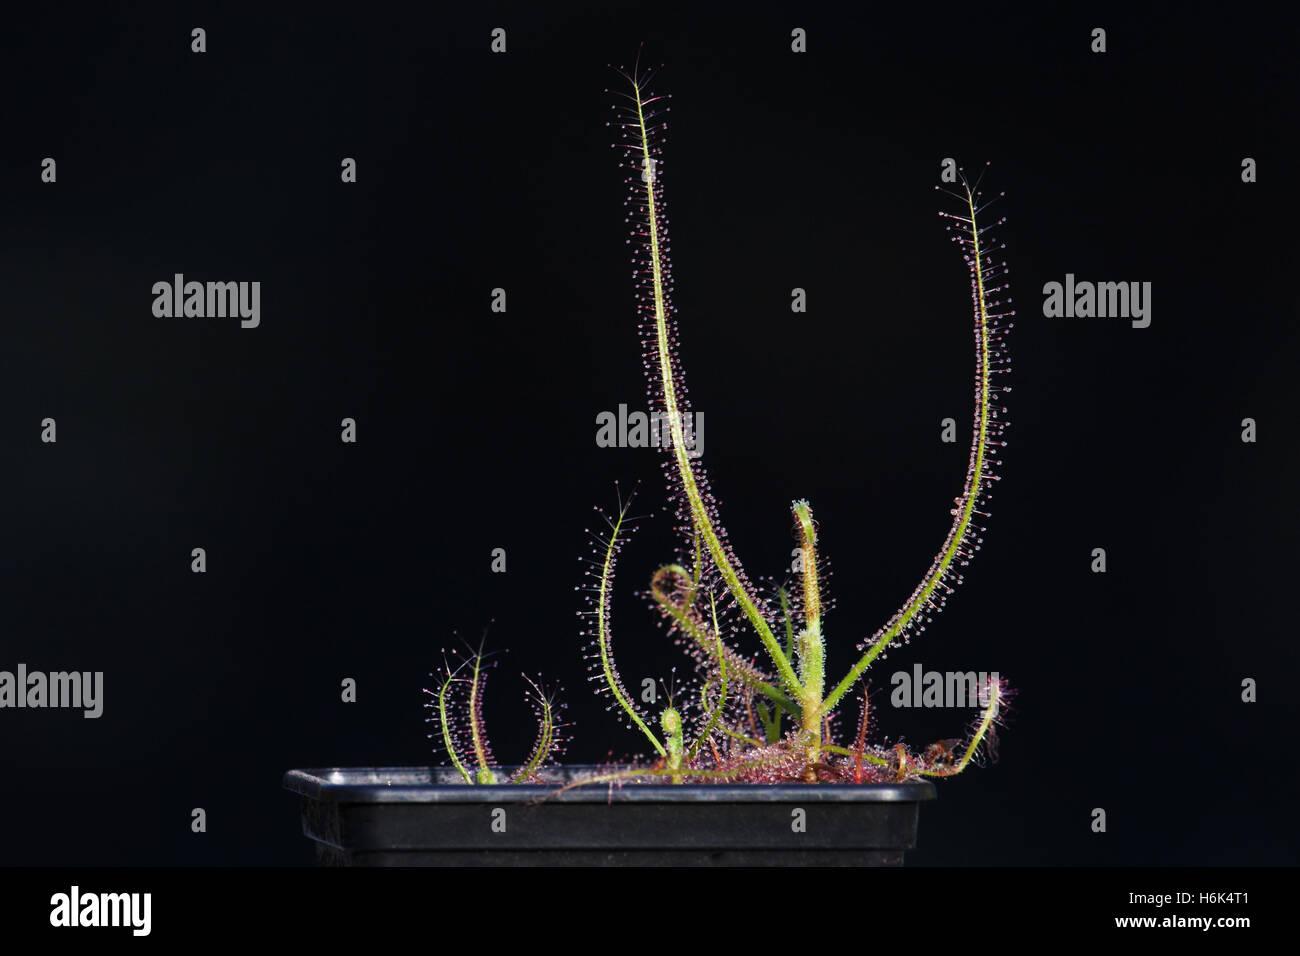 Drosera indica Sundew from Jacky Jacky Northern Queensland Australia - Stock Image